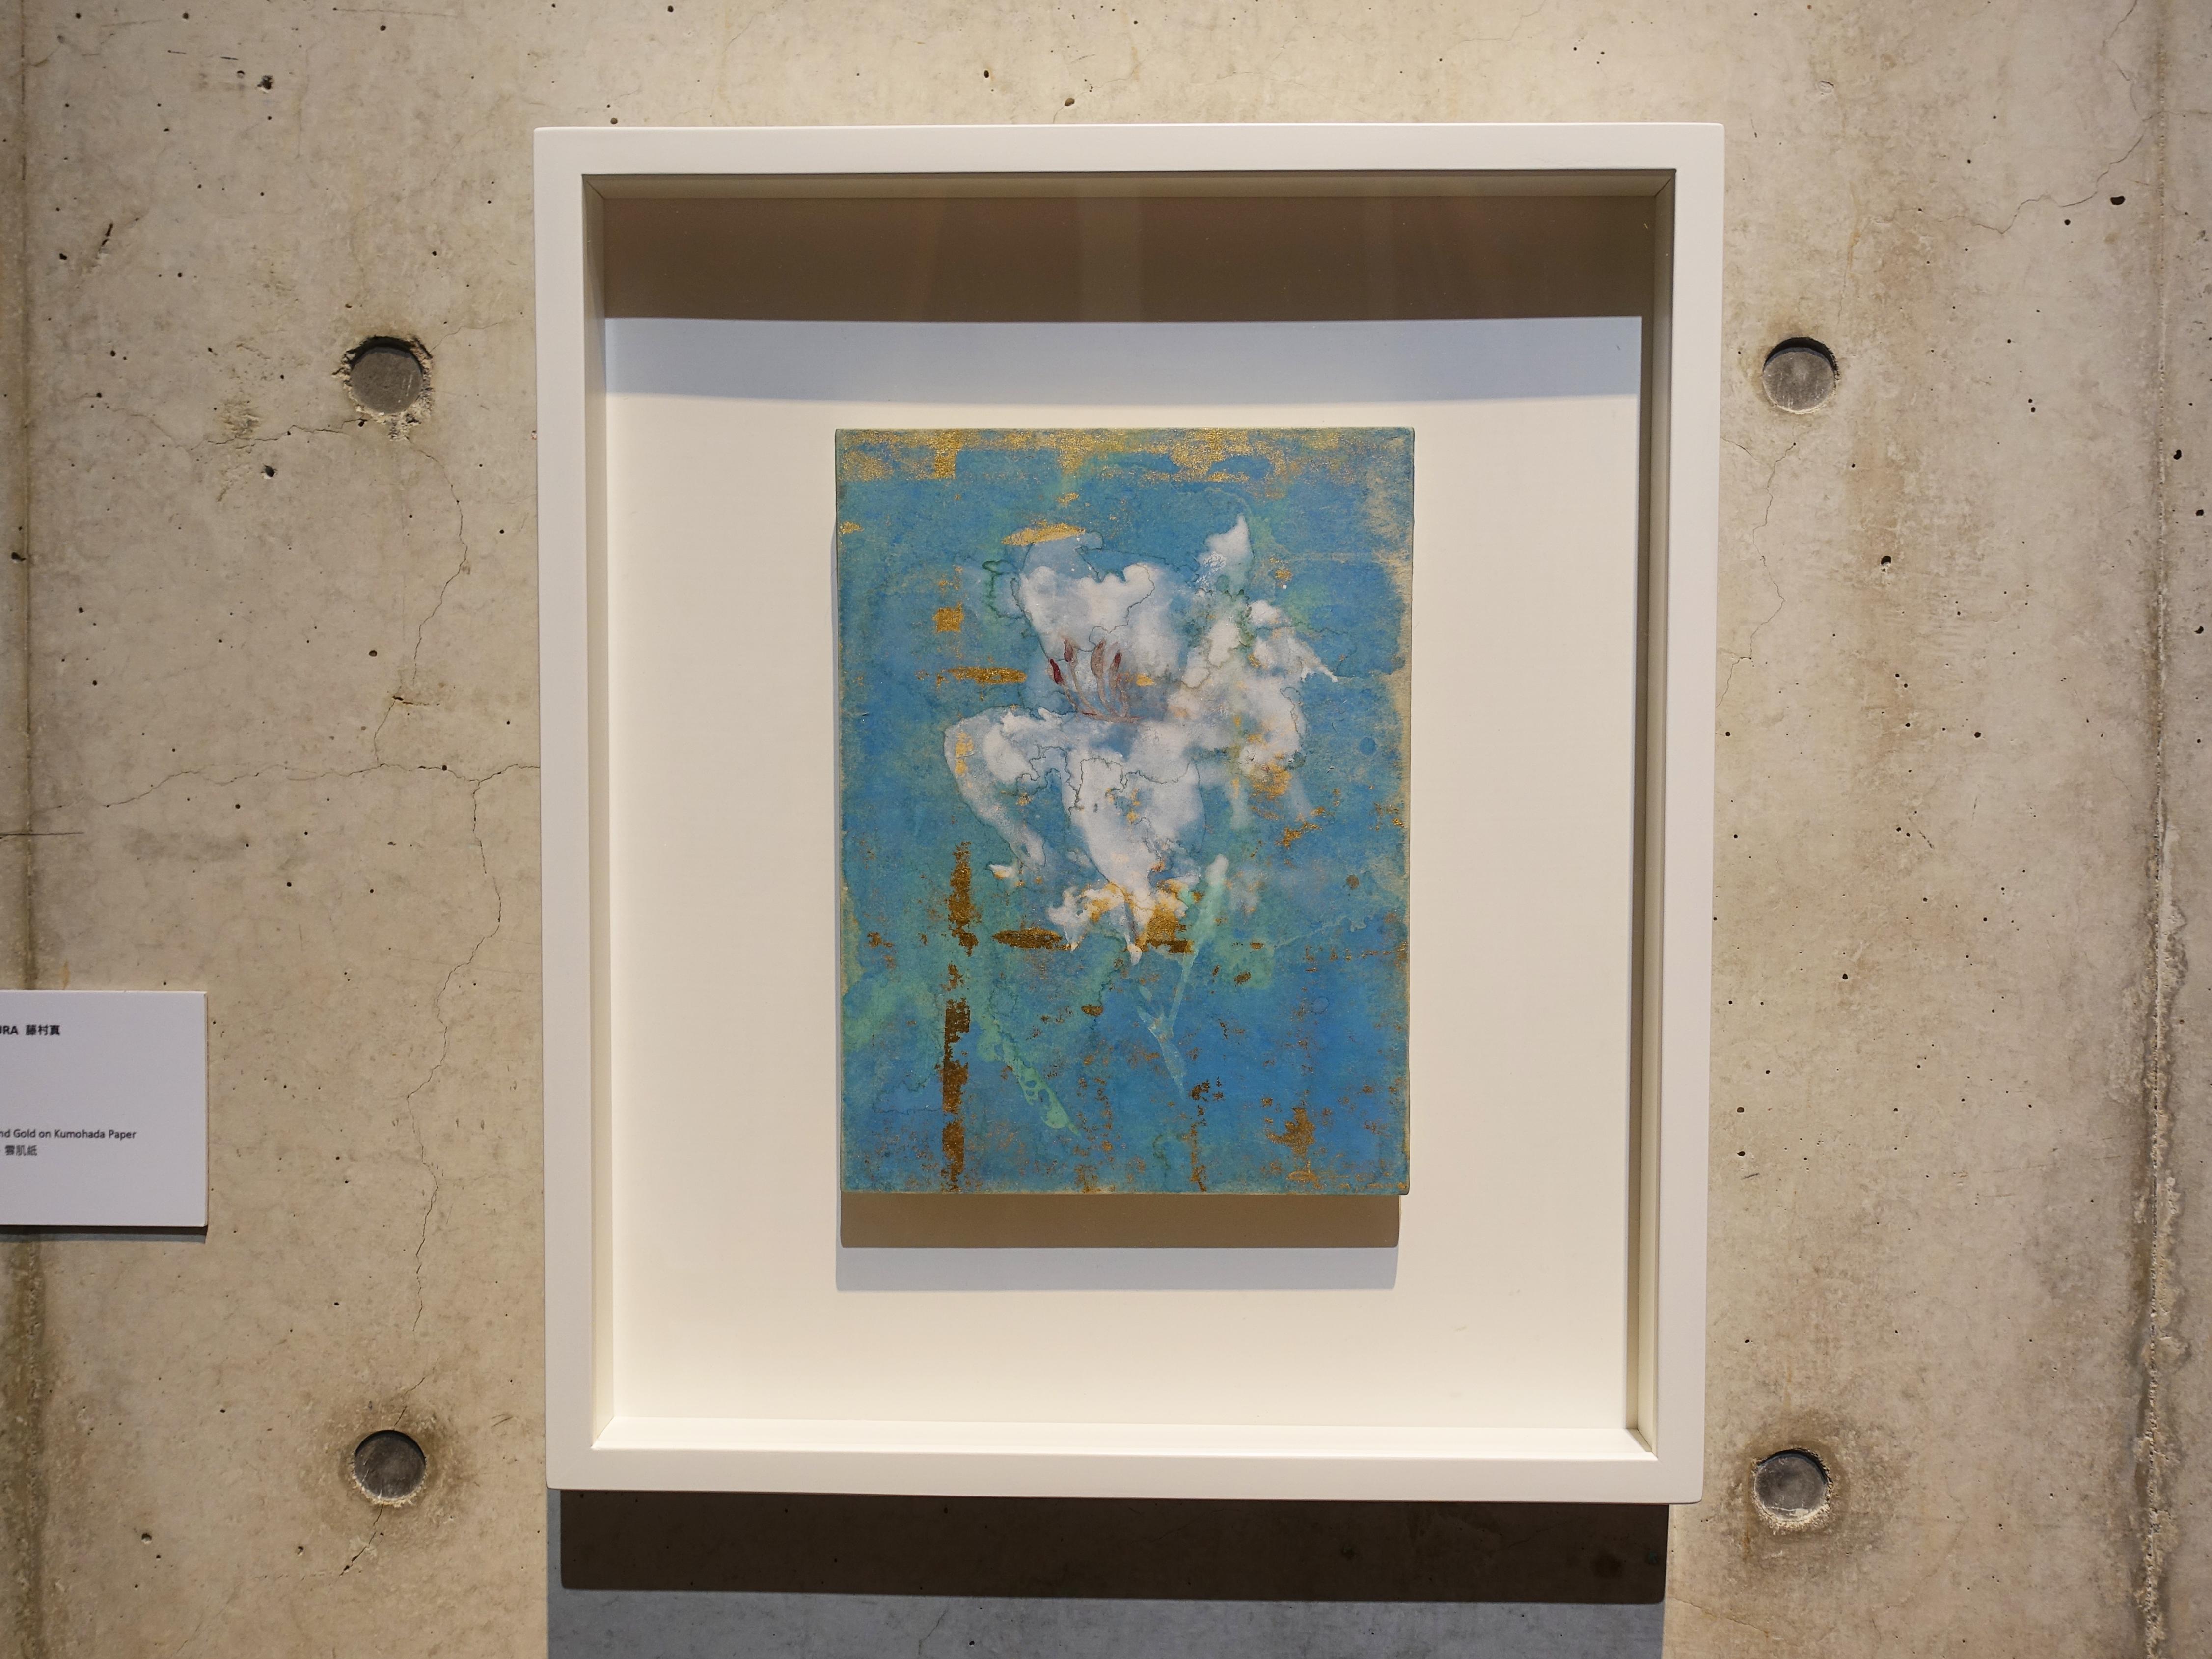 Makoto Fujimura,《Consider I 》,30 x 22.3 cm,天然礦物顏料、金、雲肌紙,2017。